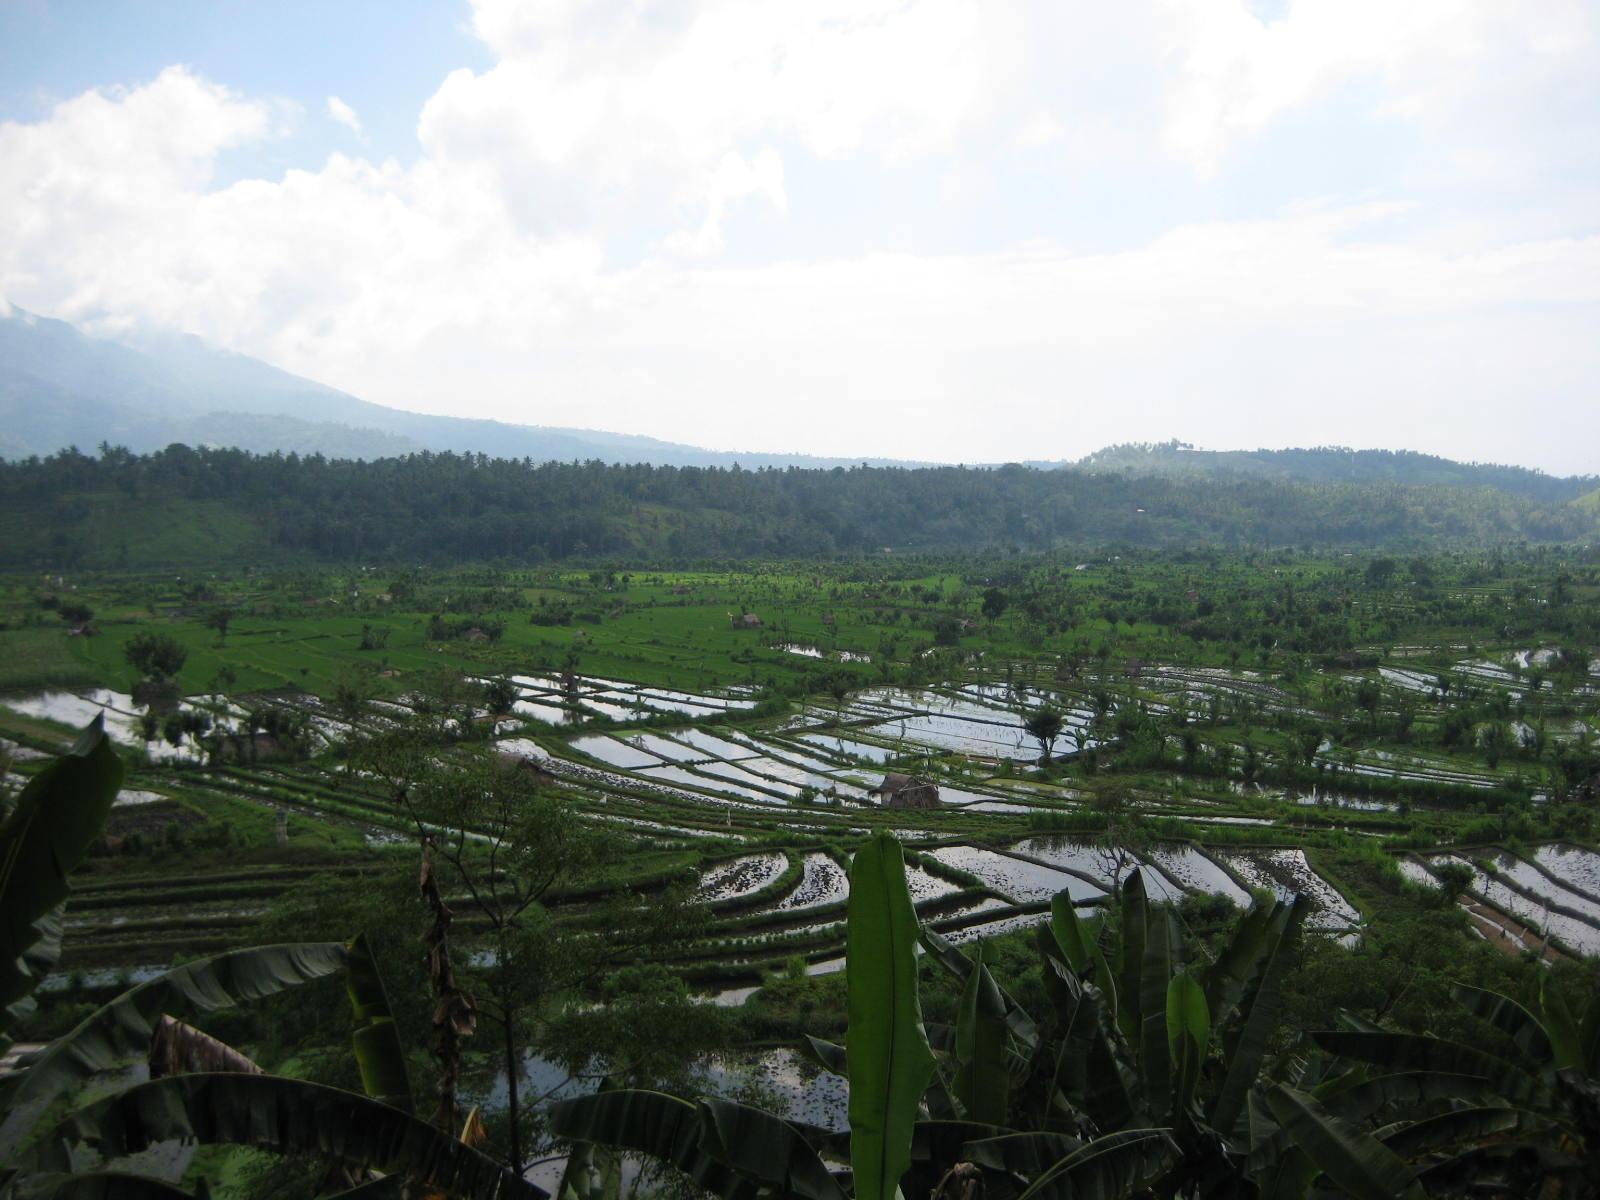 Rice paddies on the way to Bunutan